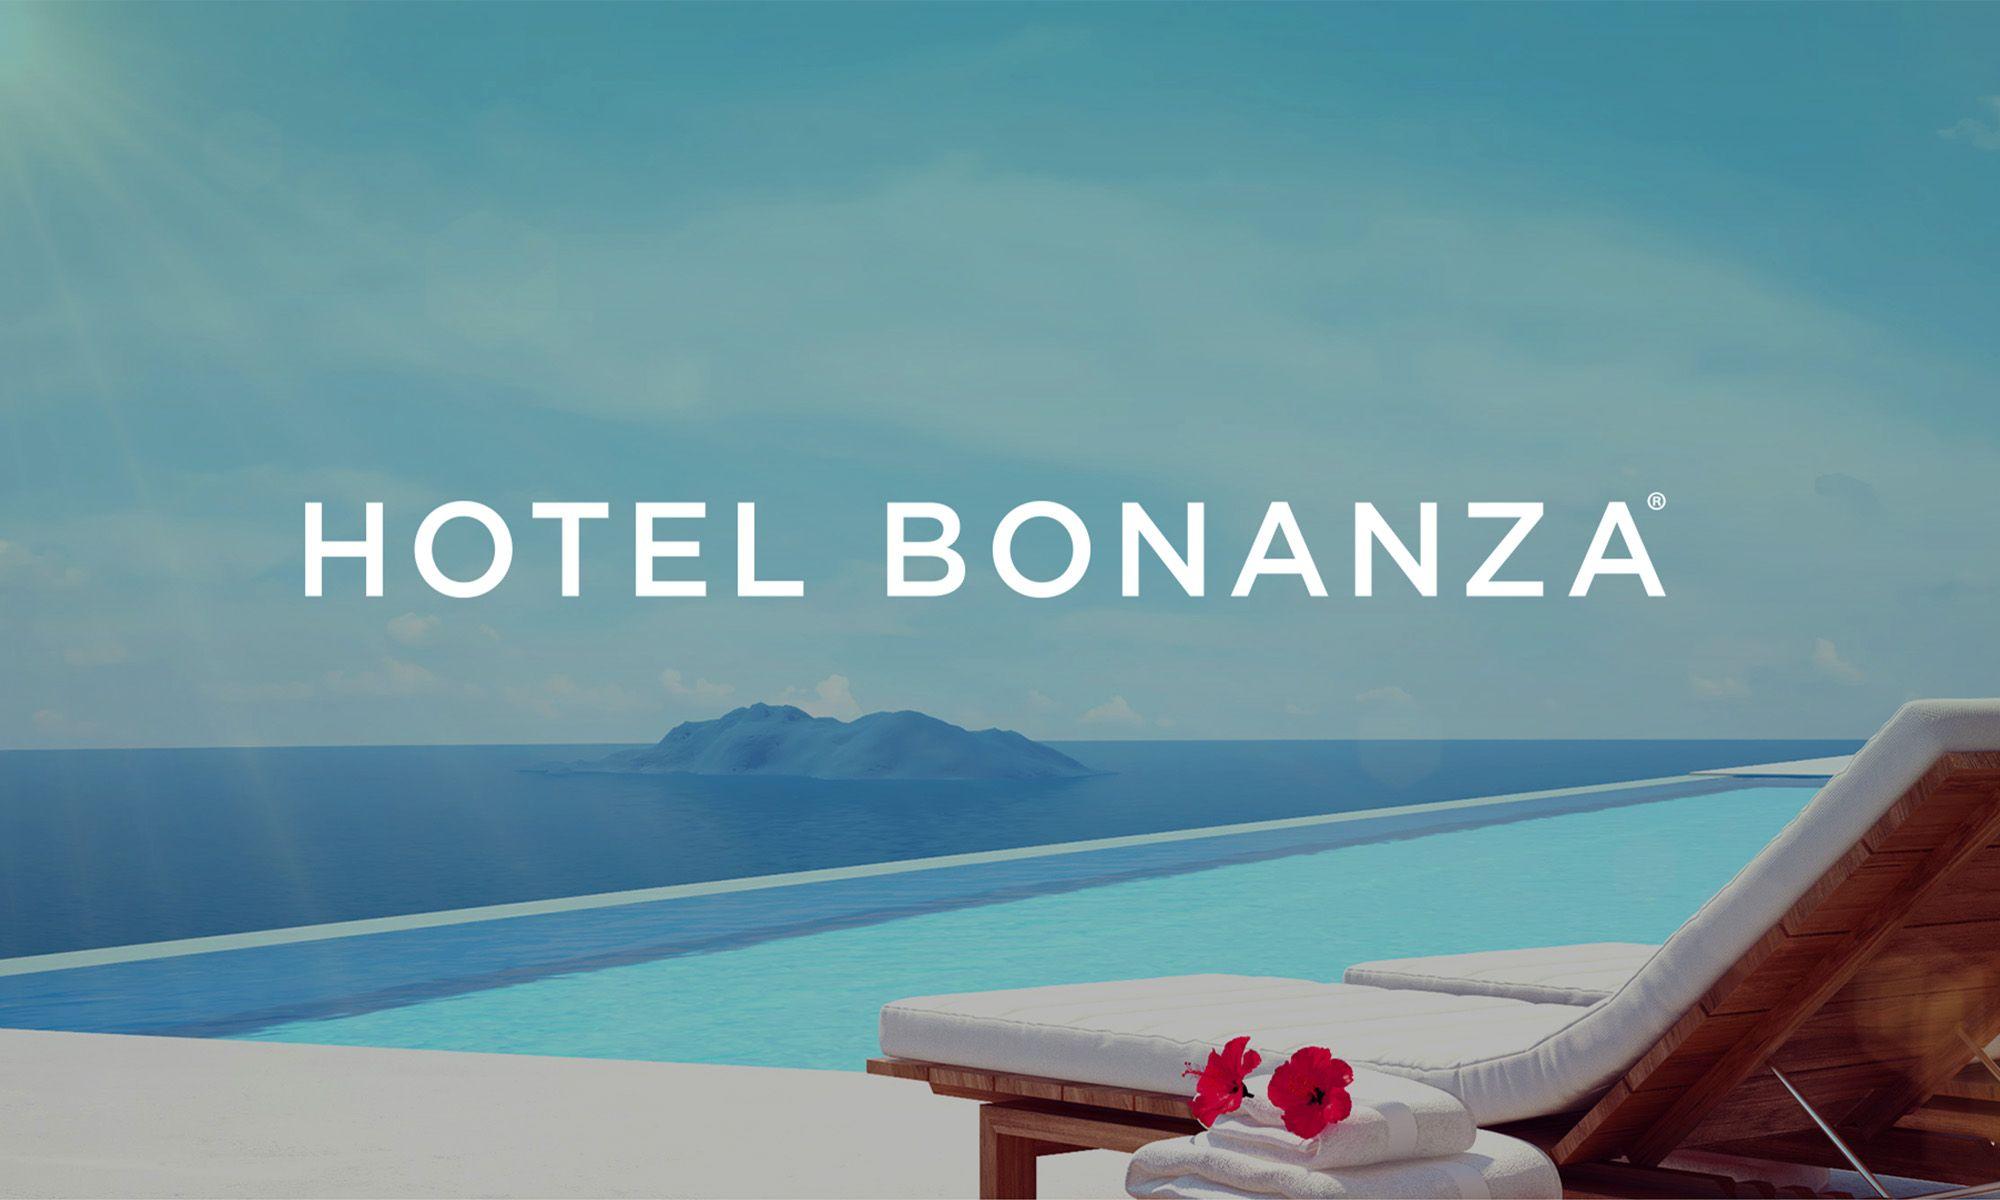 SmartHOTEL announces new connectivity with Hotel Bonanza